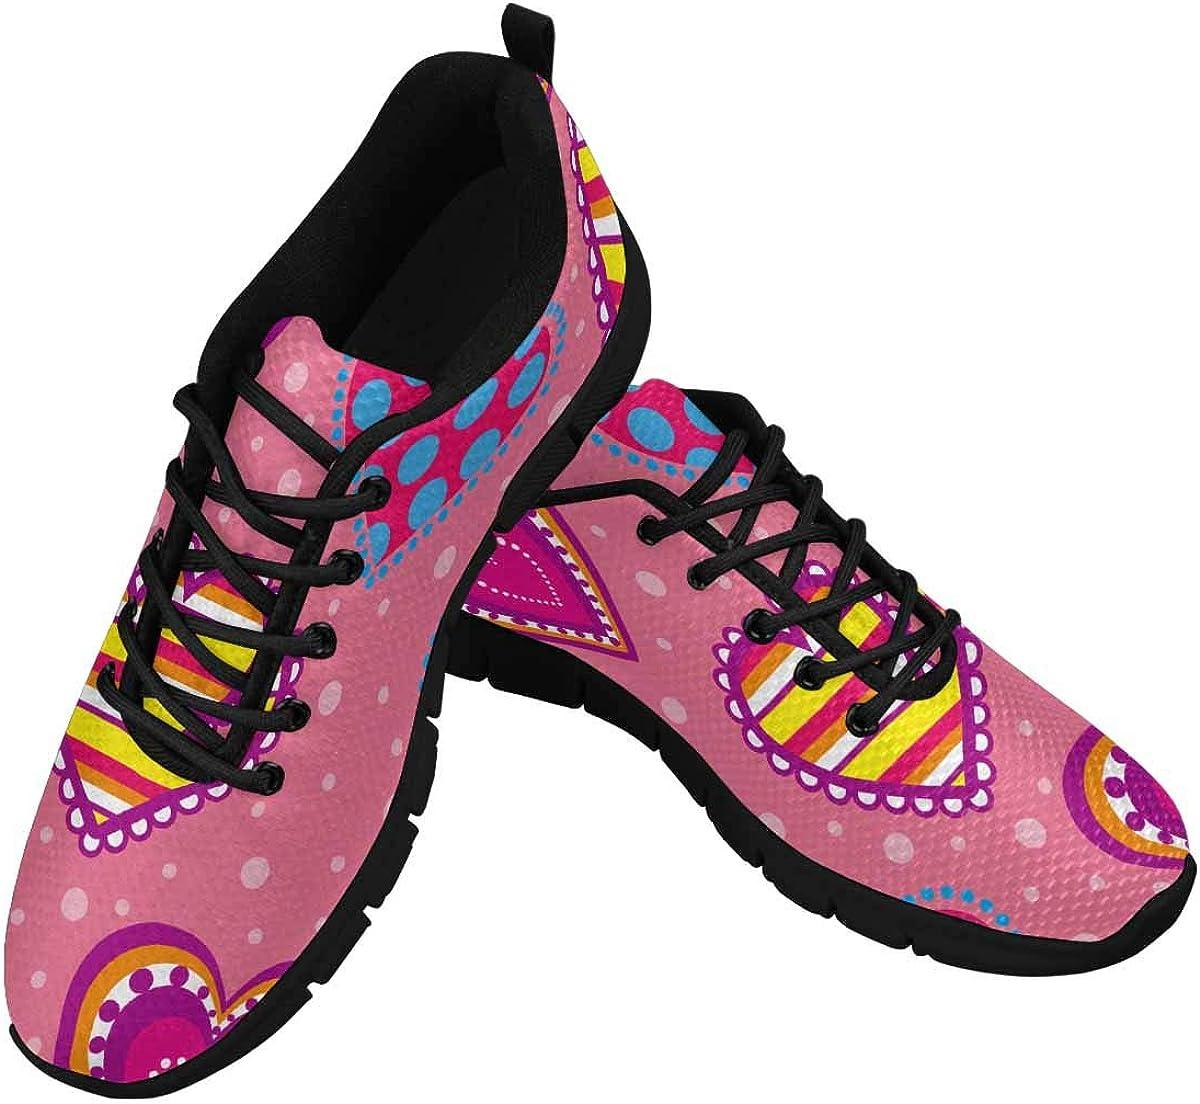 INTERESTPRINT Decorative Multicolor Hearts Women's Athletic Walking Shoes Breathe Comfort Mesh